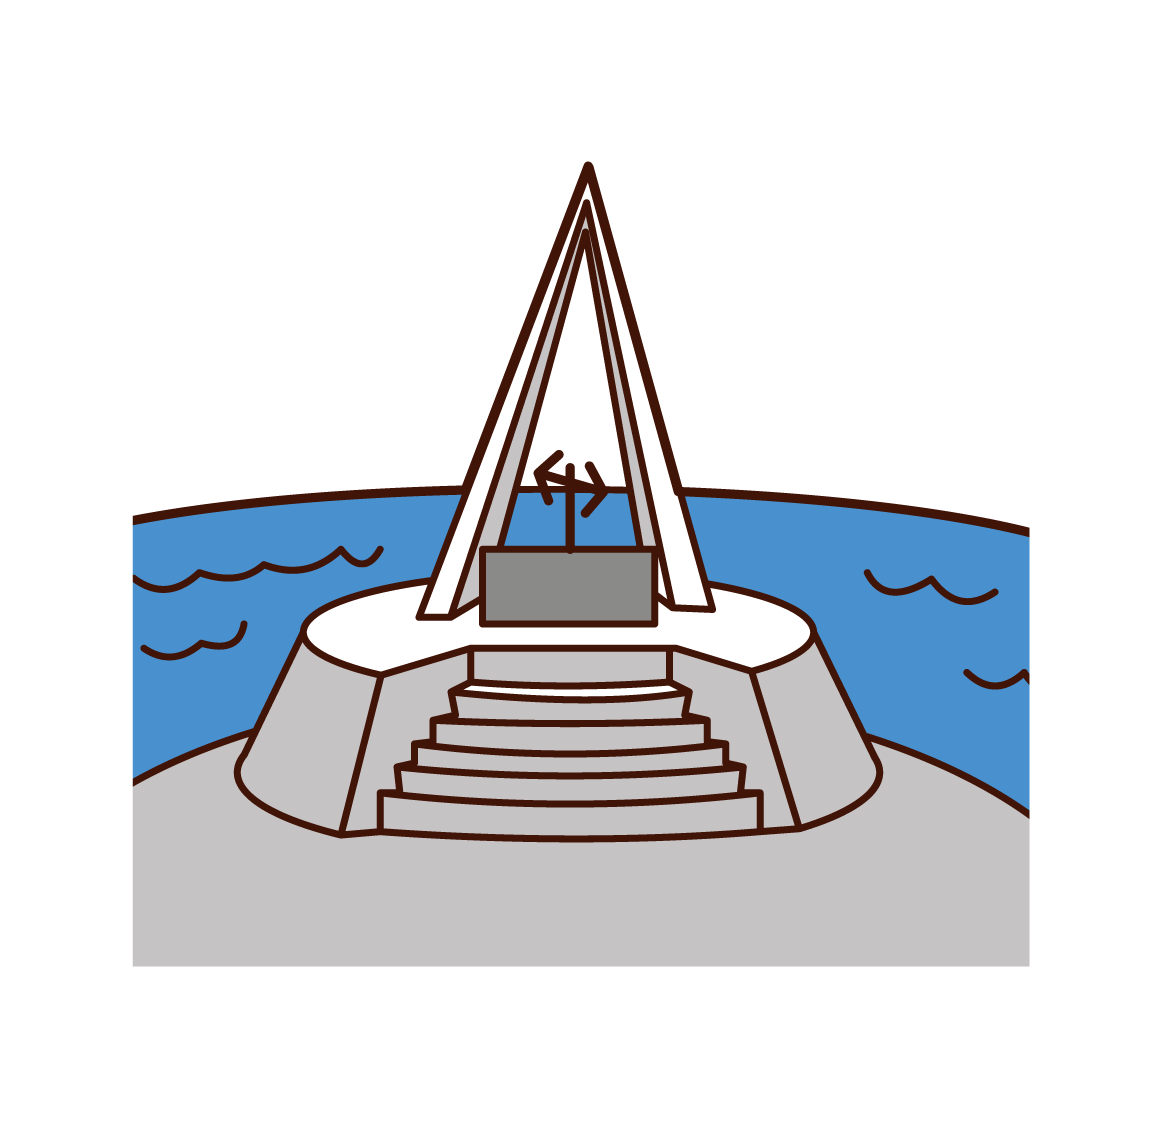 Illustration of Cape Soya